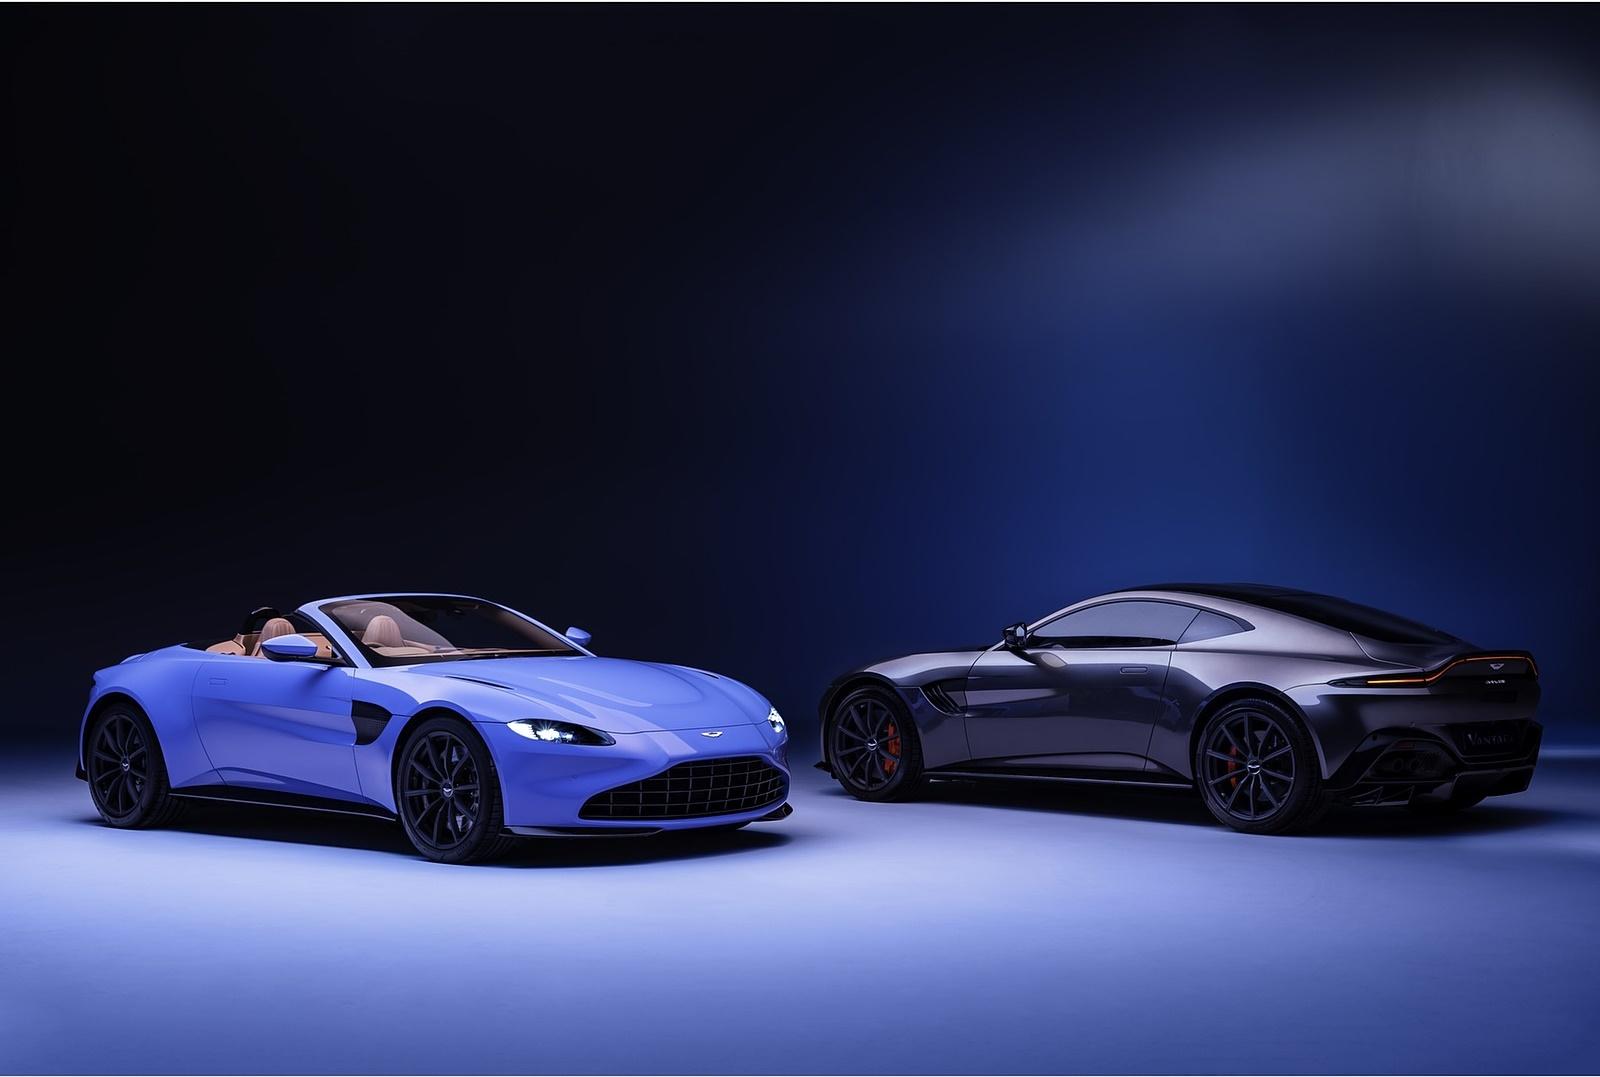 2021 Aston Martin Vantage Roadster Wallpapers (8)